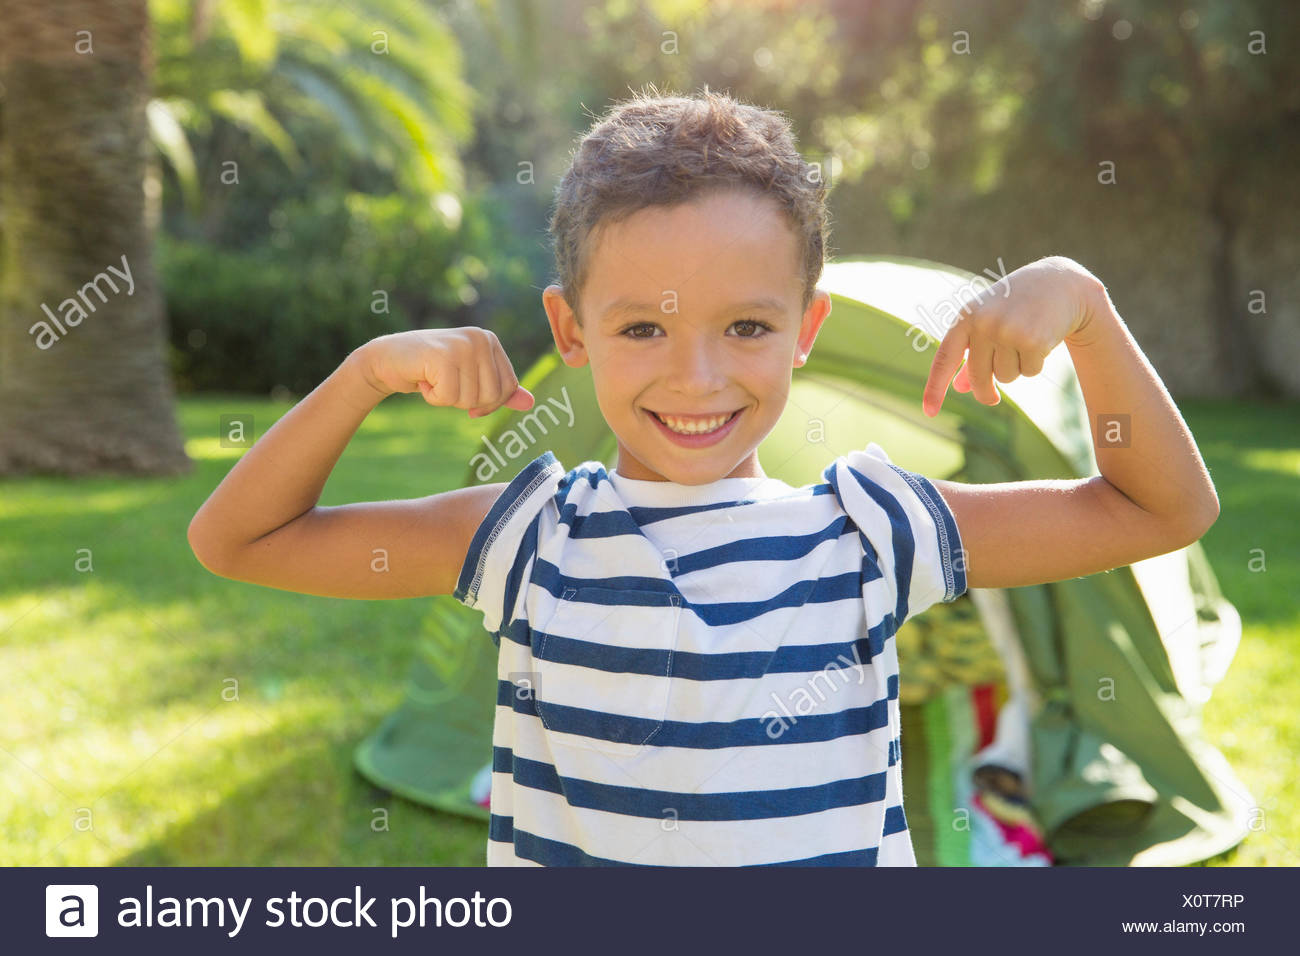 Portrait of boy in garden flexing muscles - Stock Image